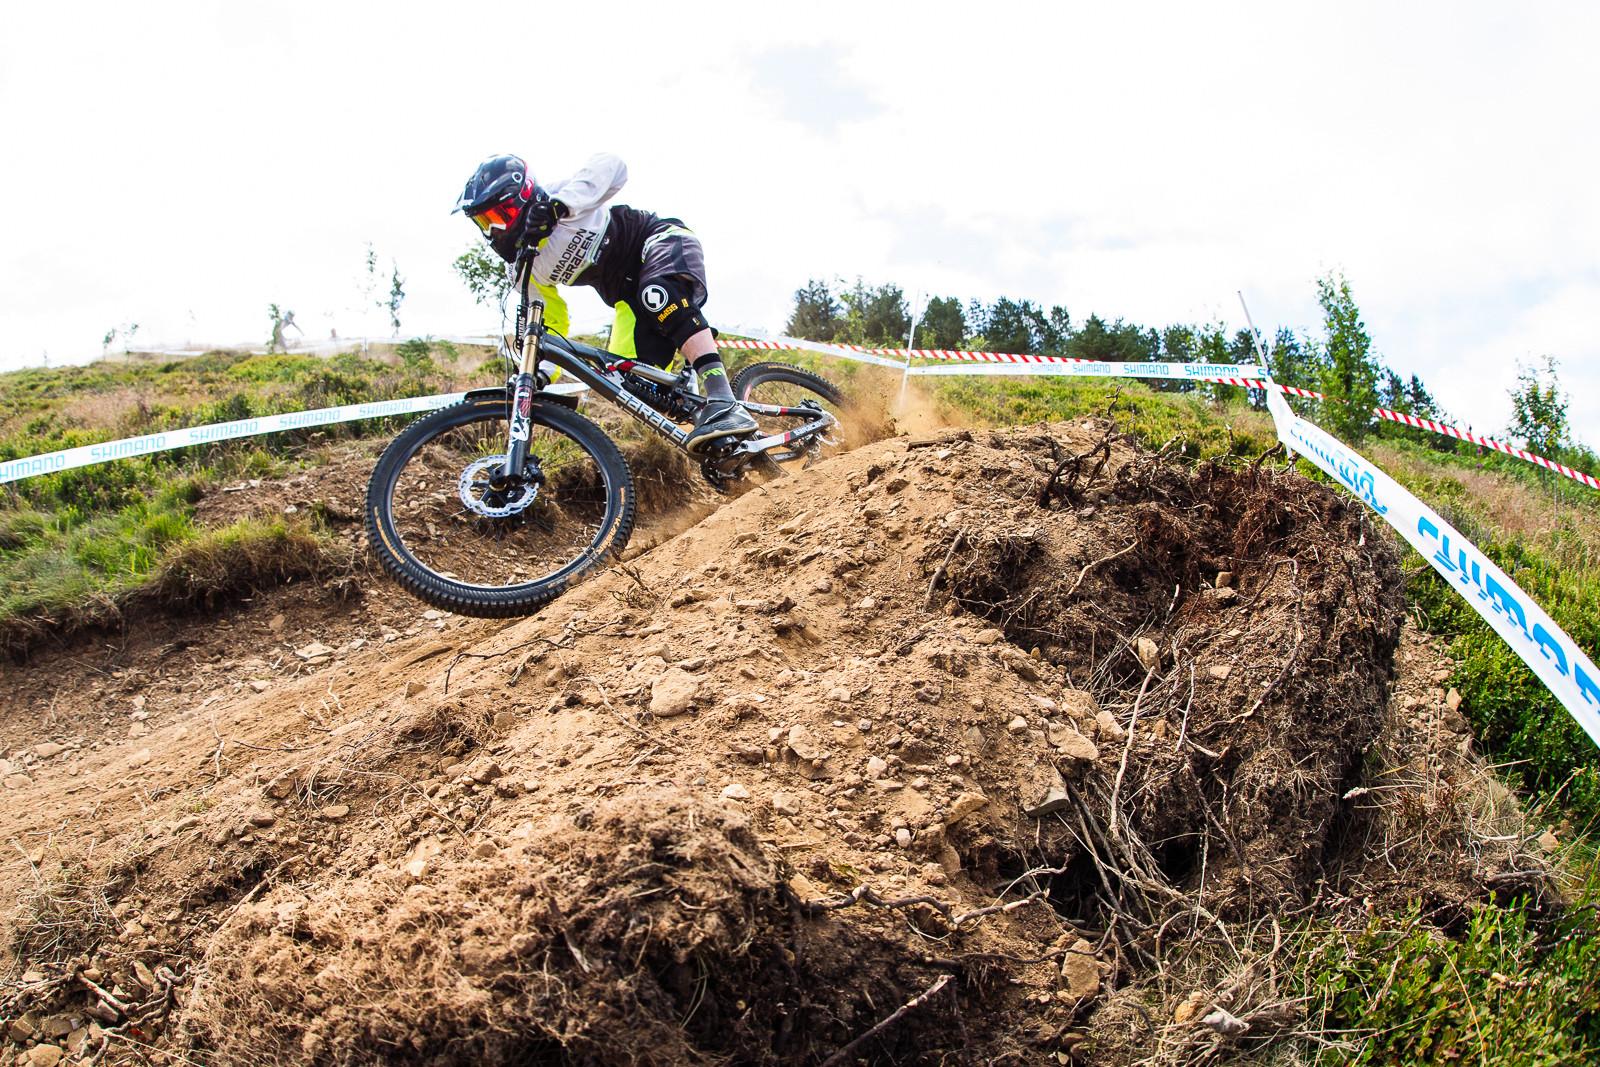 Matt Walker - 2015 British National Champs Downhill - 2015 British National Champs Downhill Photos - Mountain Biking Pictures - Vital MTB